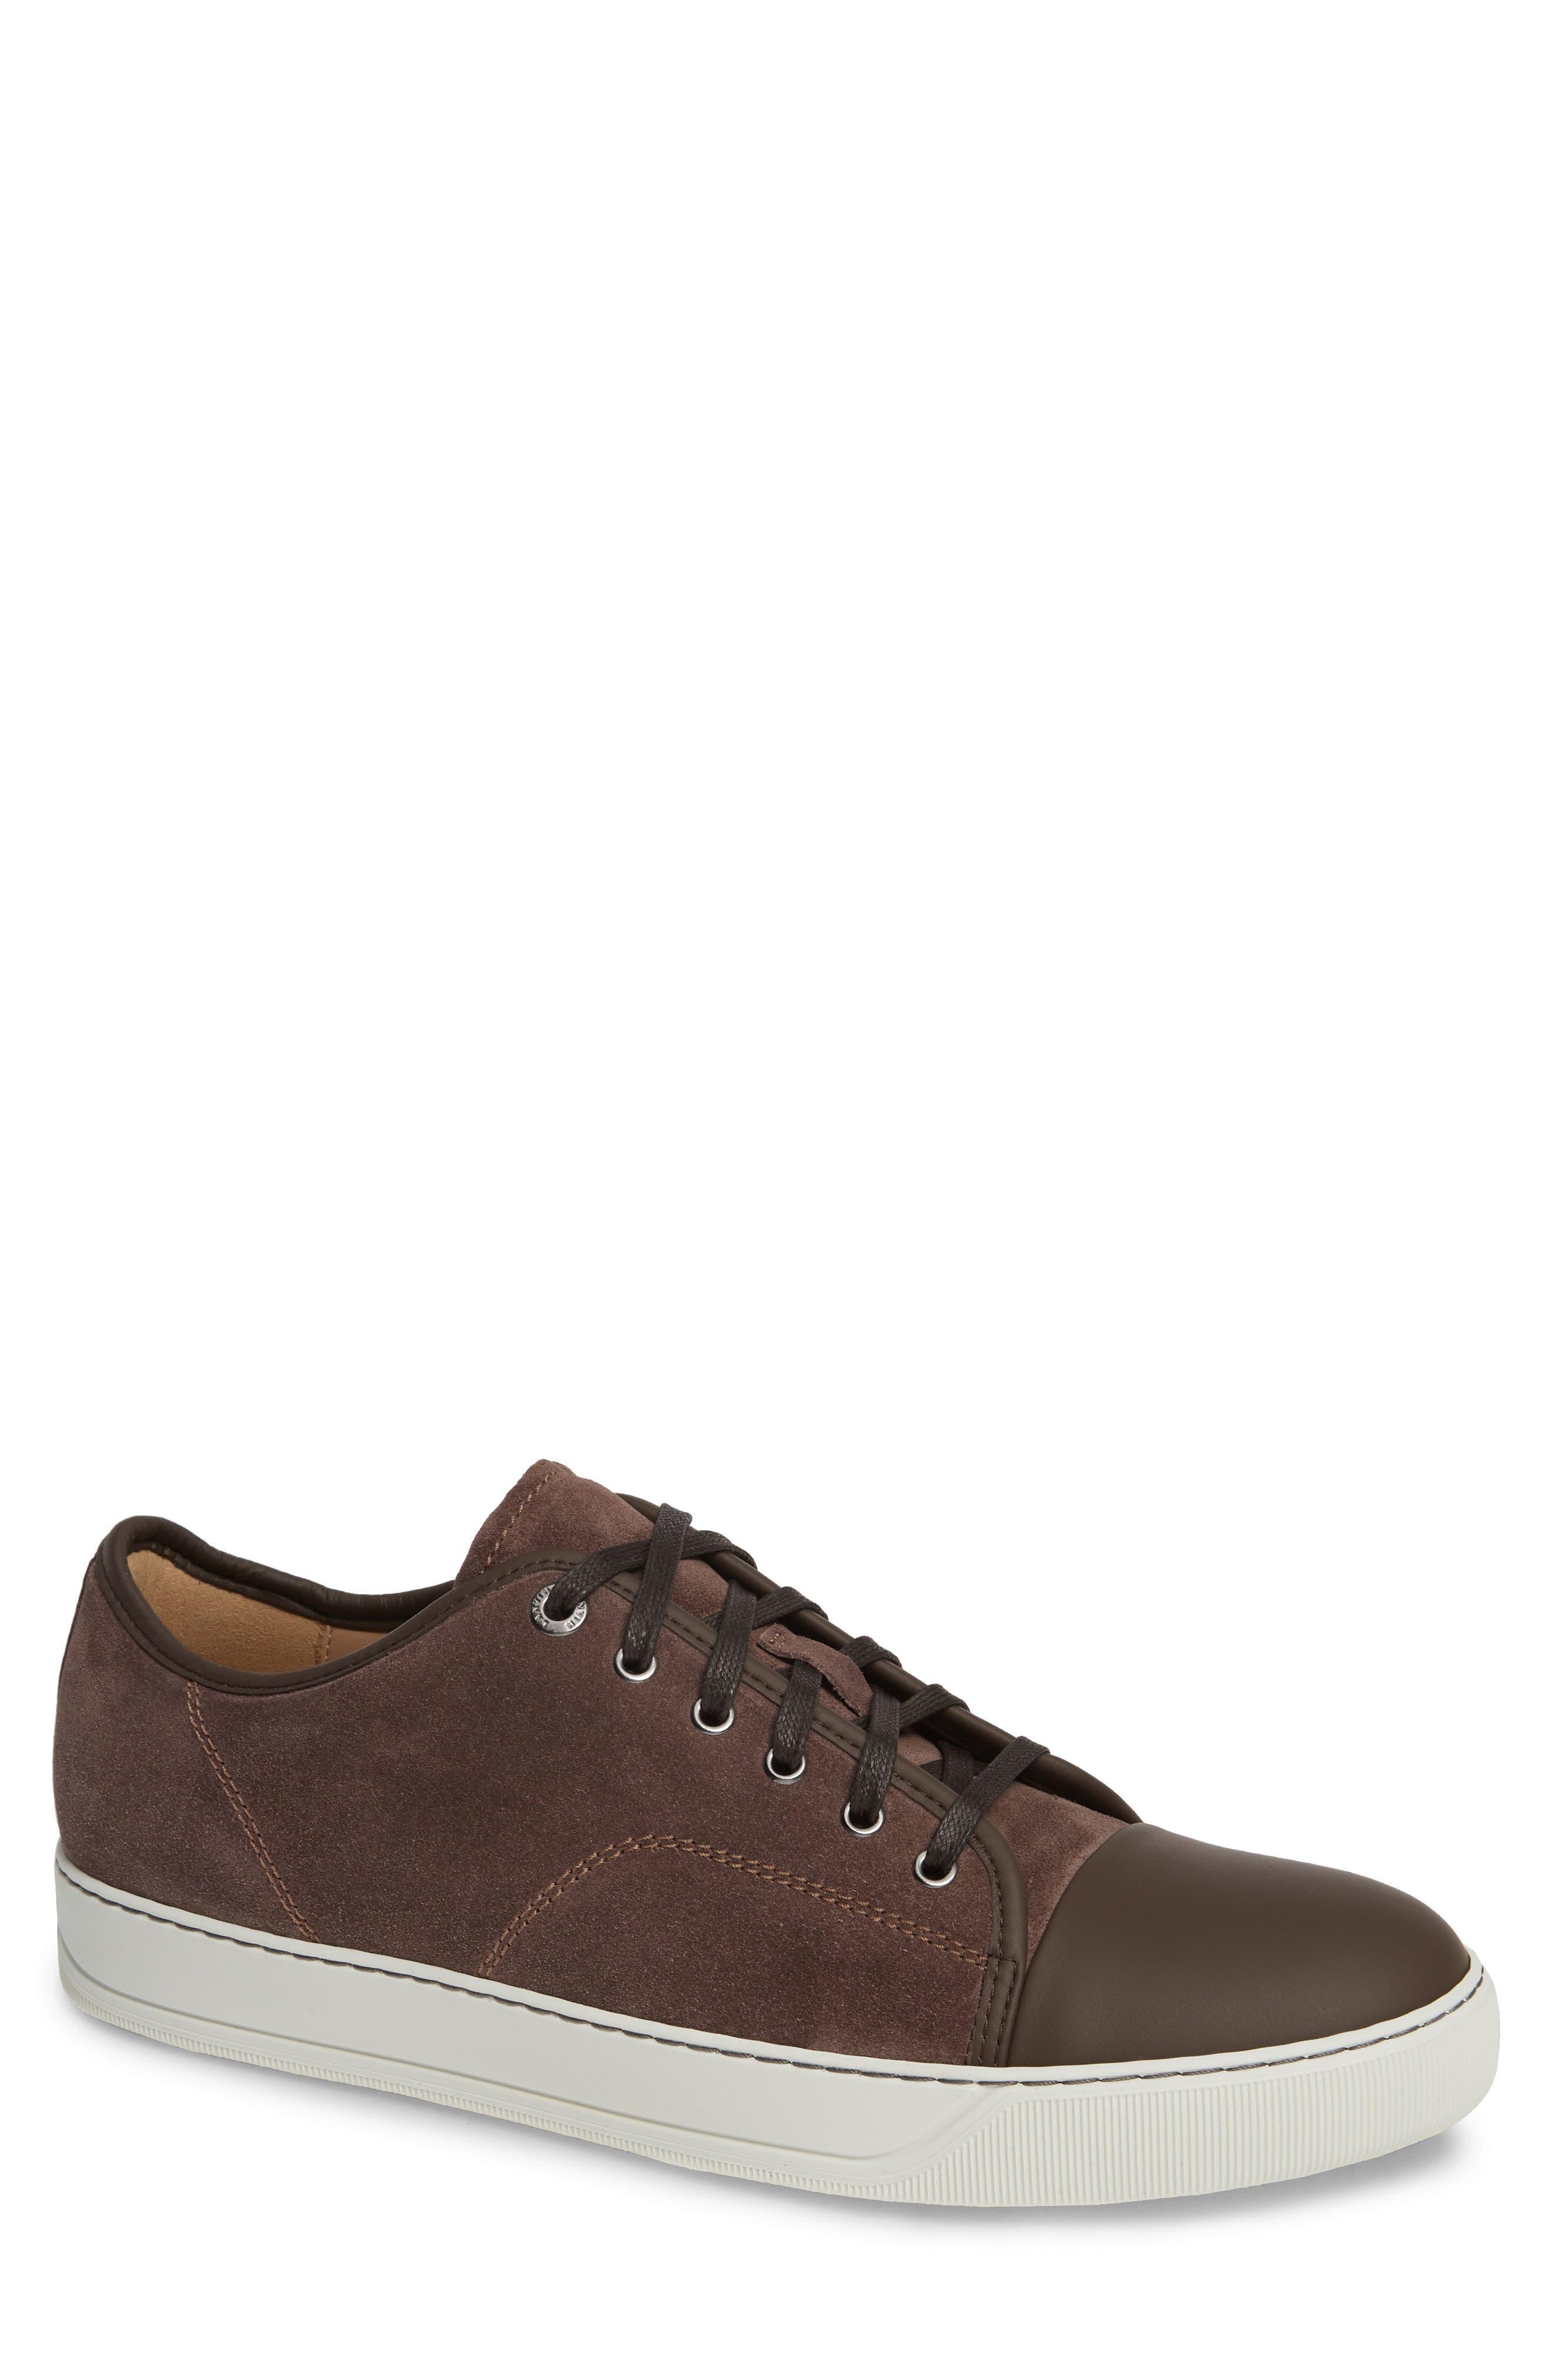 LANVIN, Low Top Sneaker, Main thumbnail 1, color, CLAY